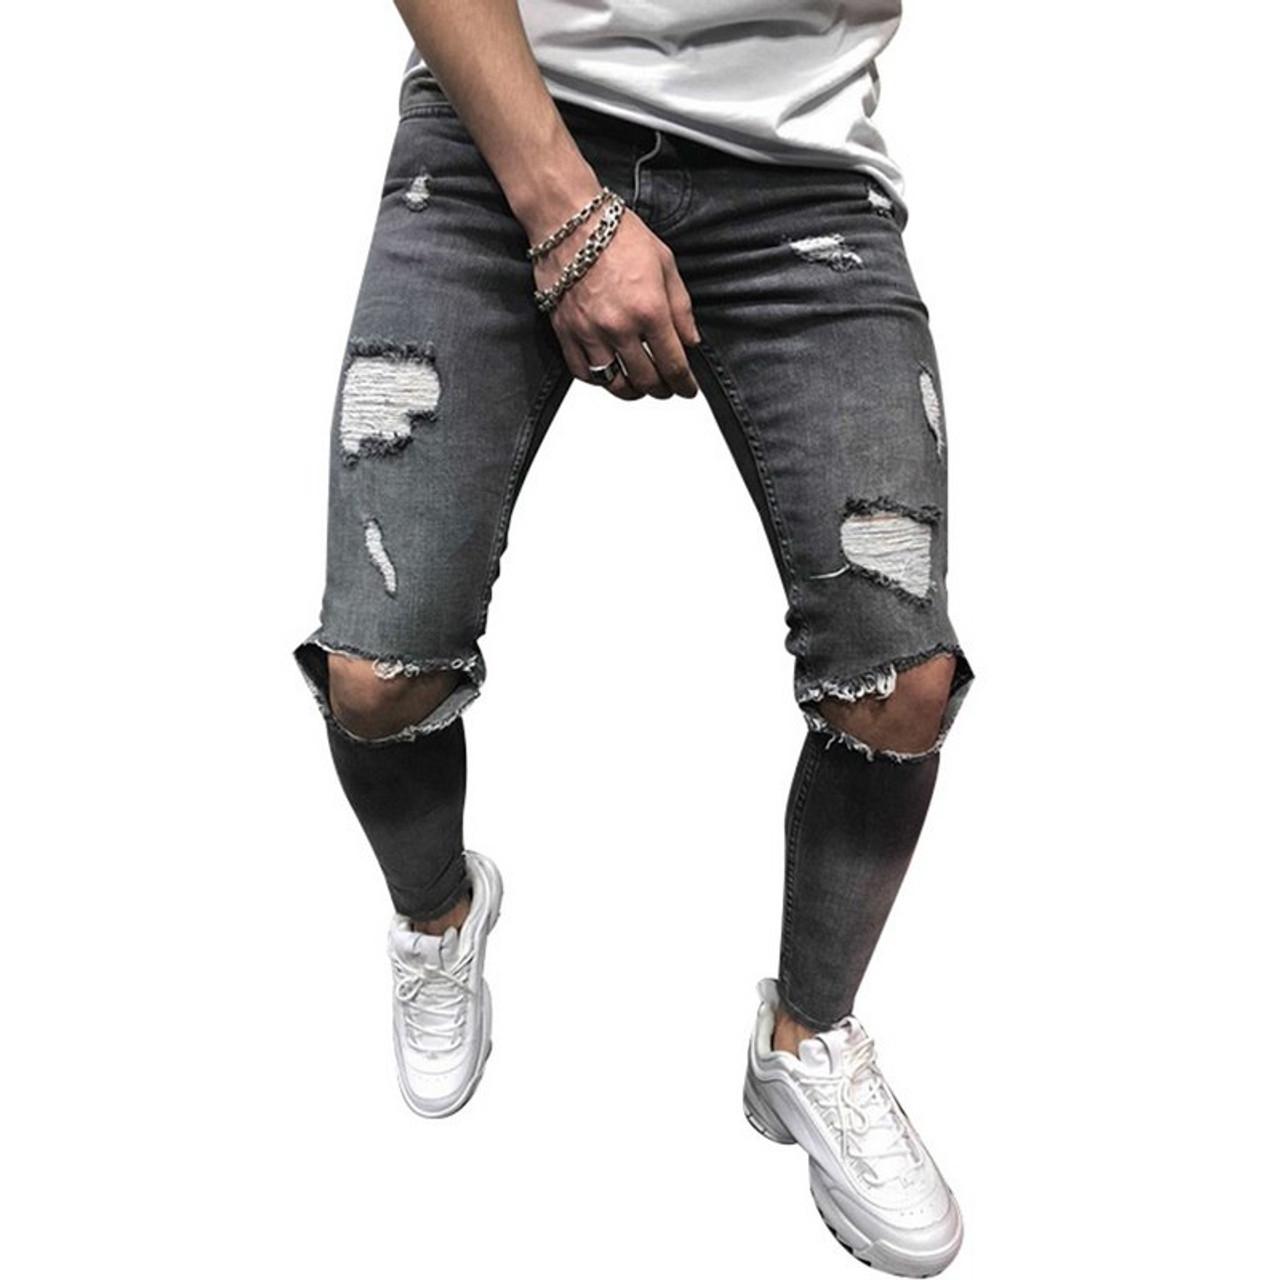 de4c41733ee6 ... WENYUJH 2019 Cotton Jean Men s Pants Vintage Hole Cool Trousers Guys  Summer Europe America Style Plus ...